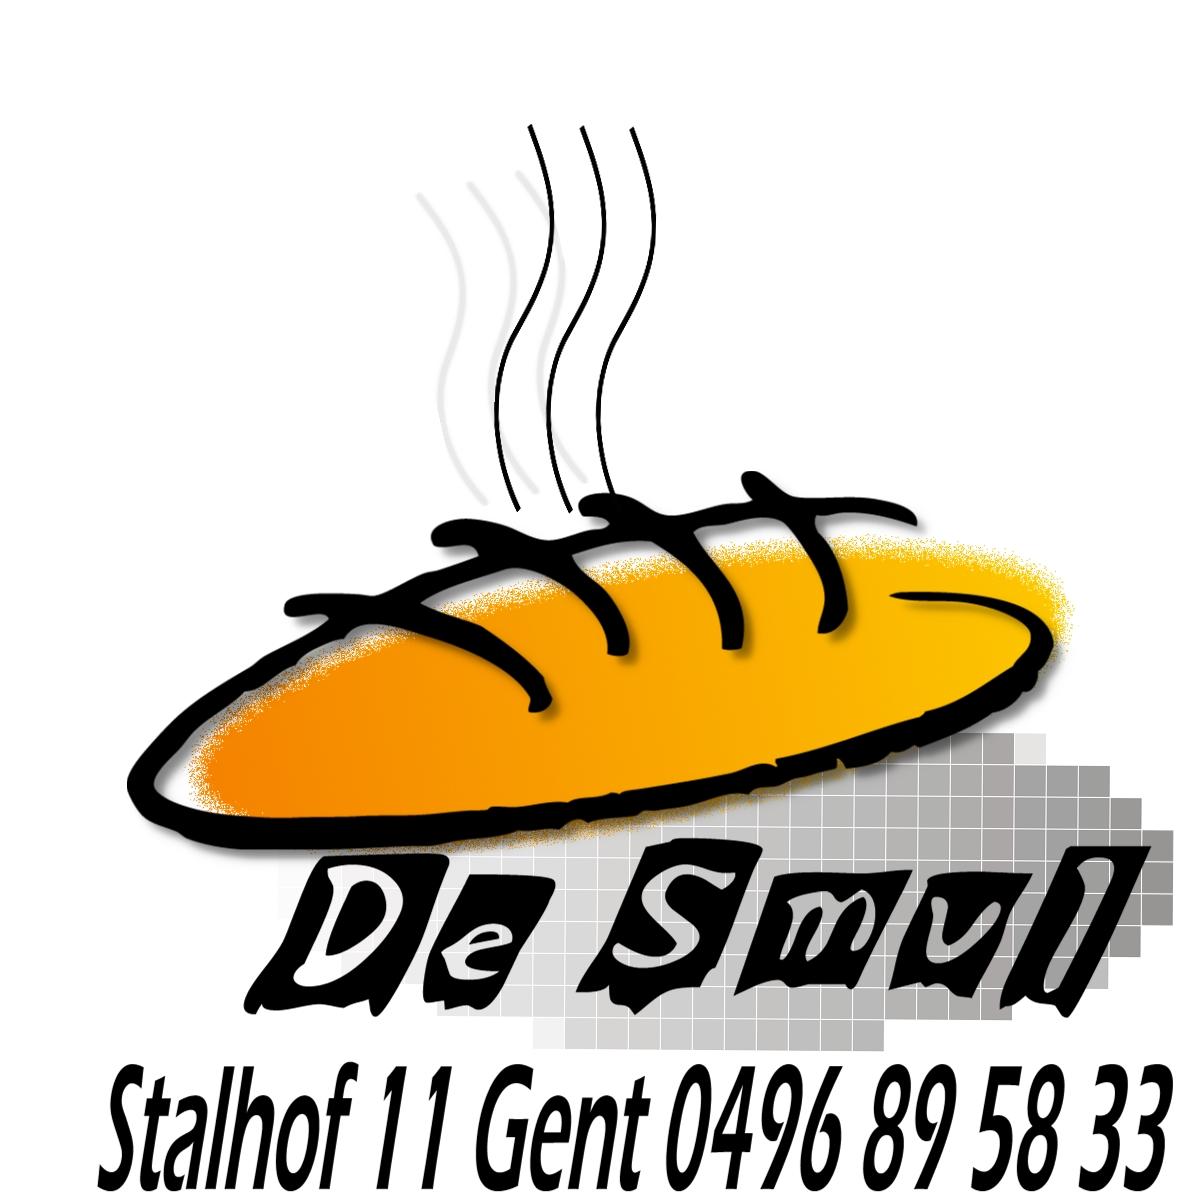 384540_150740821697293_337119039_n